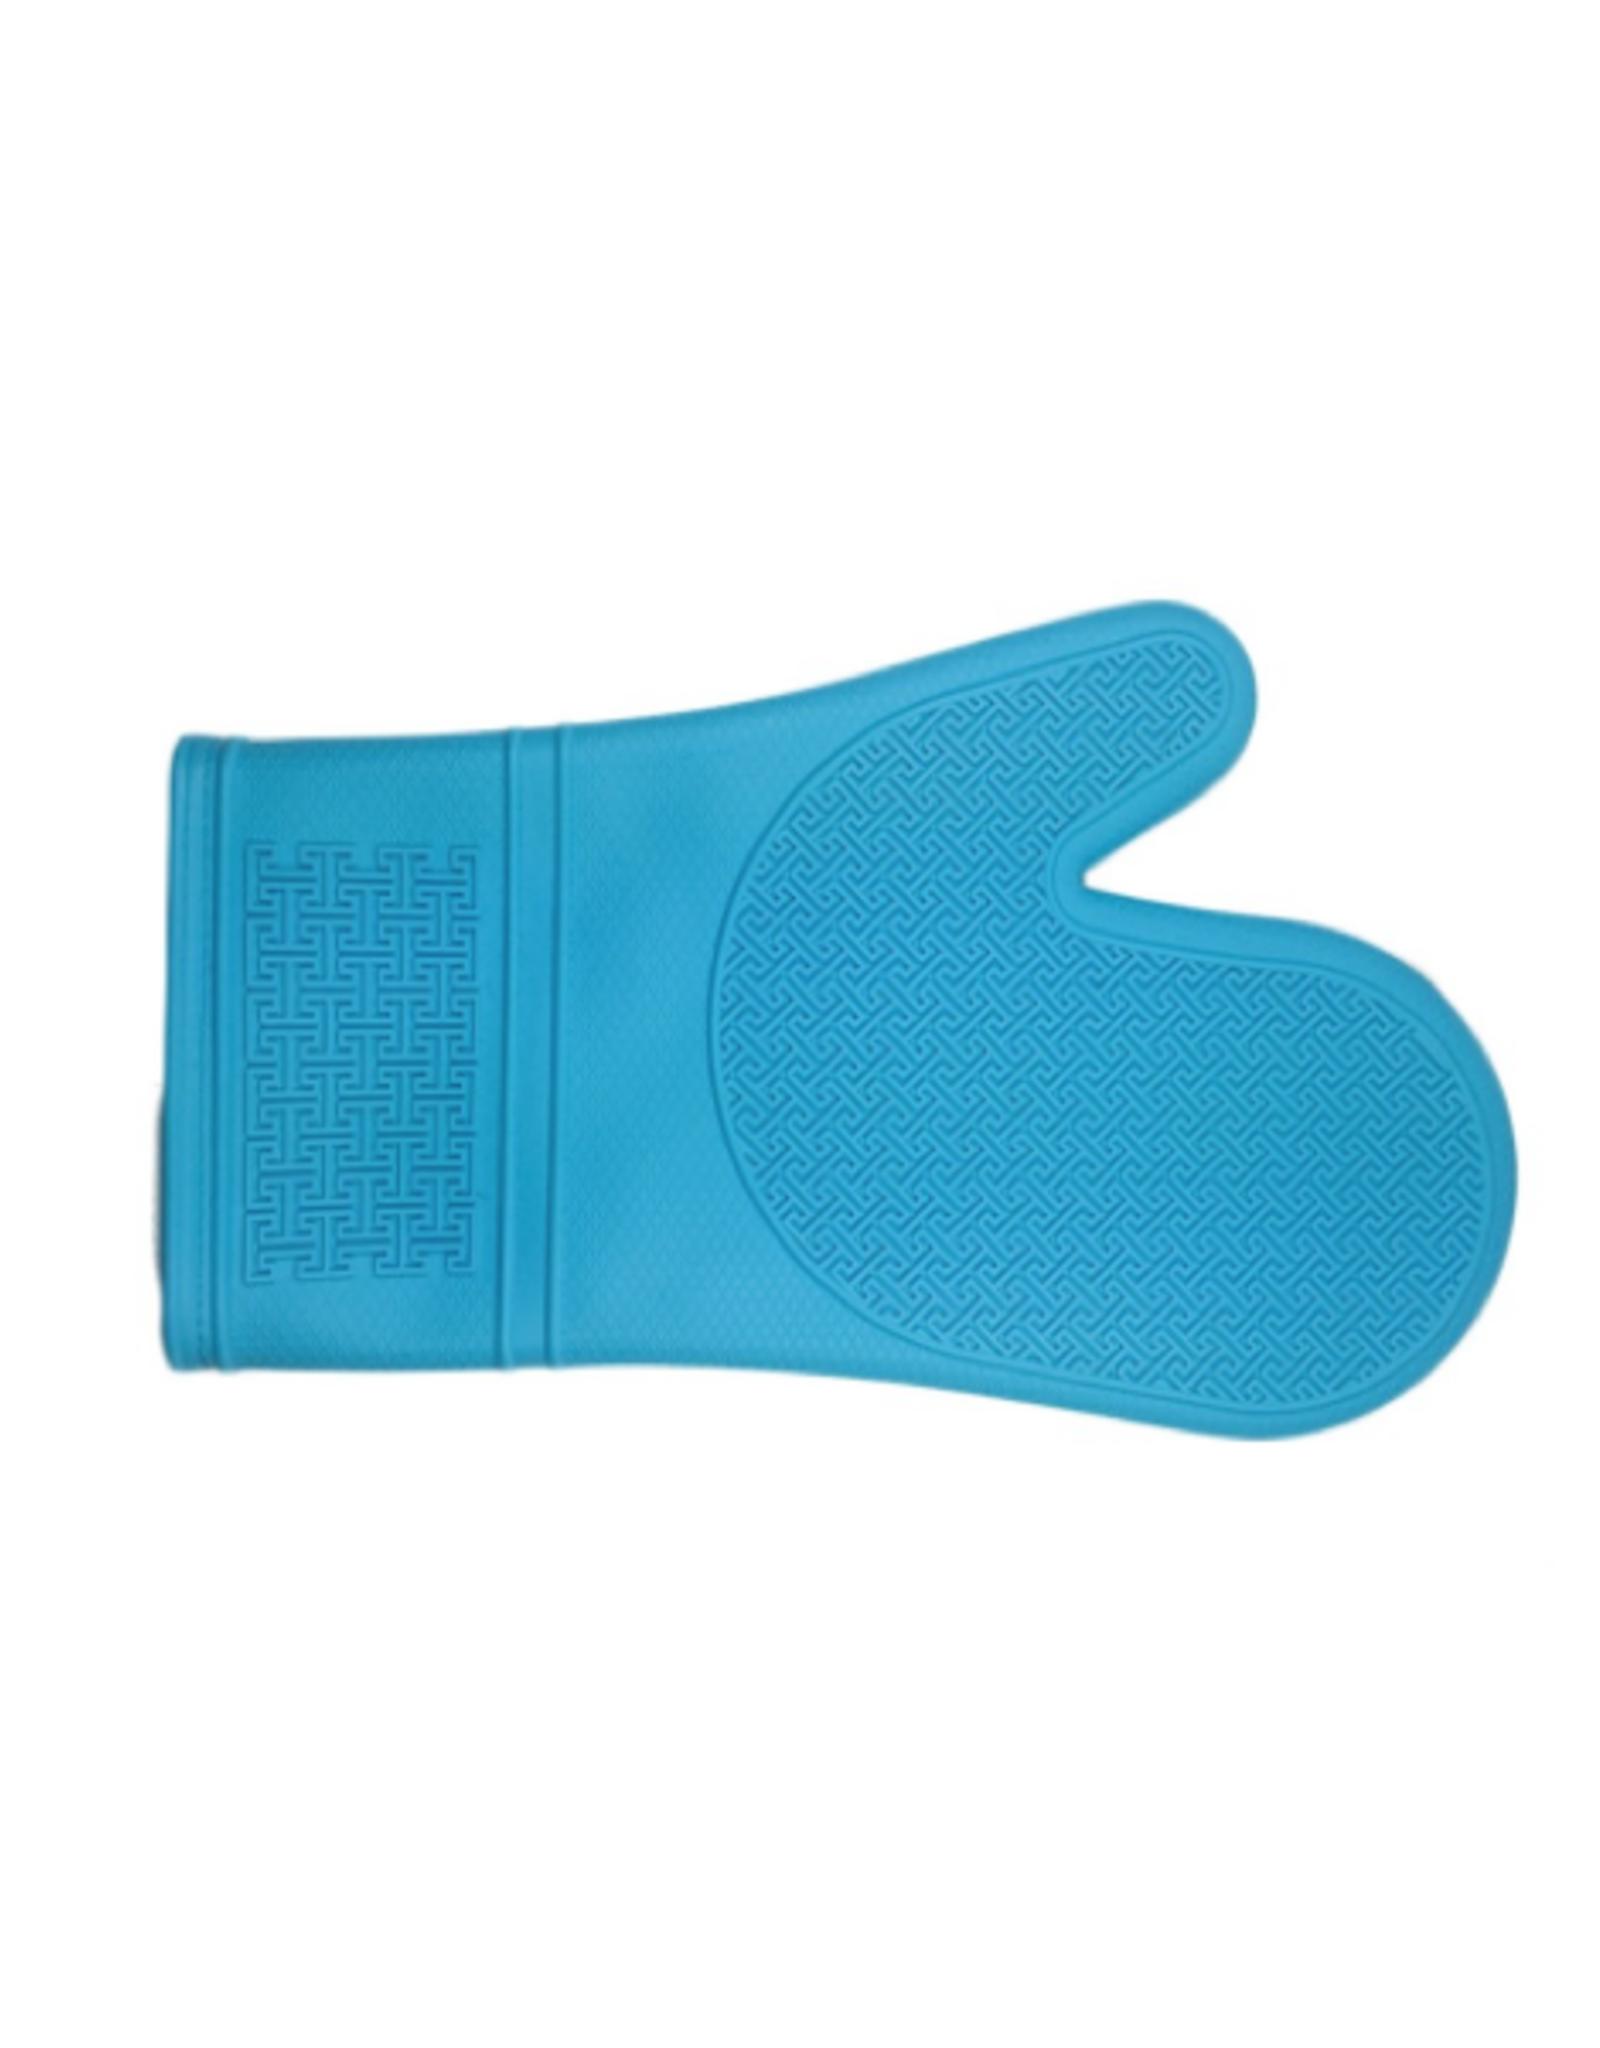 PLE - Silicone Oven Mitt / Turquoise